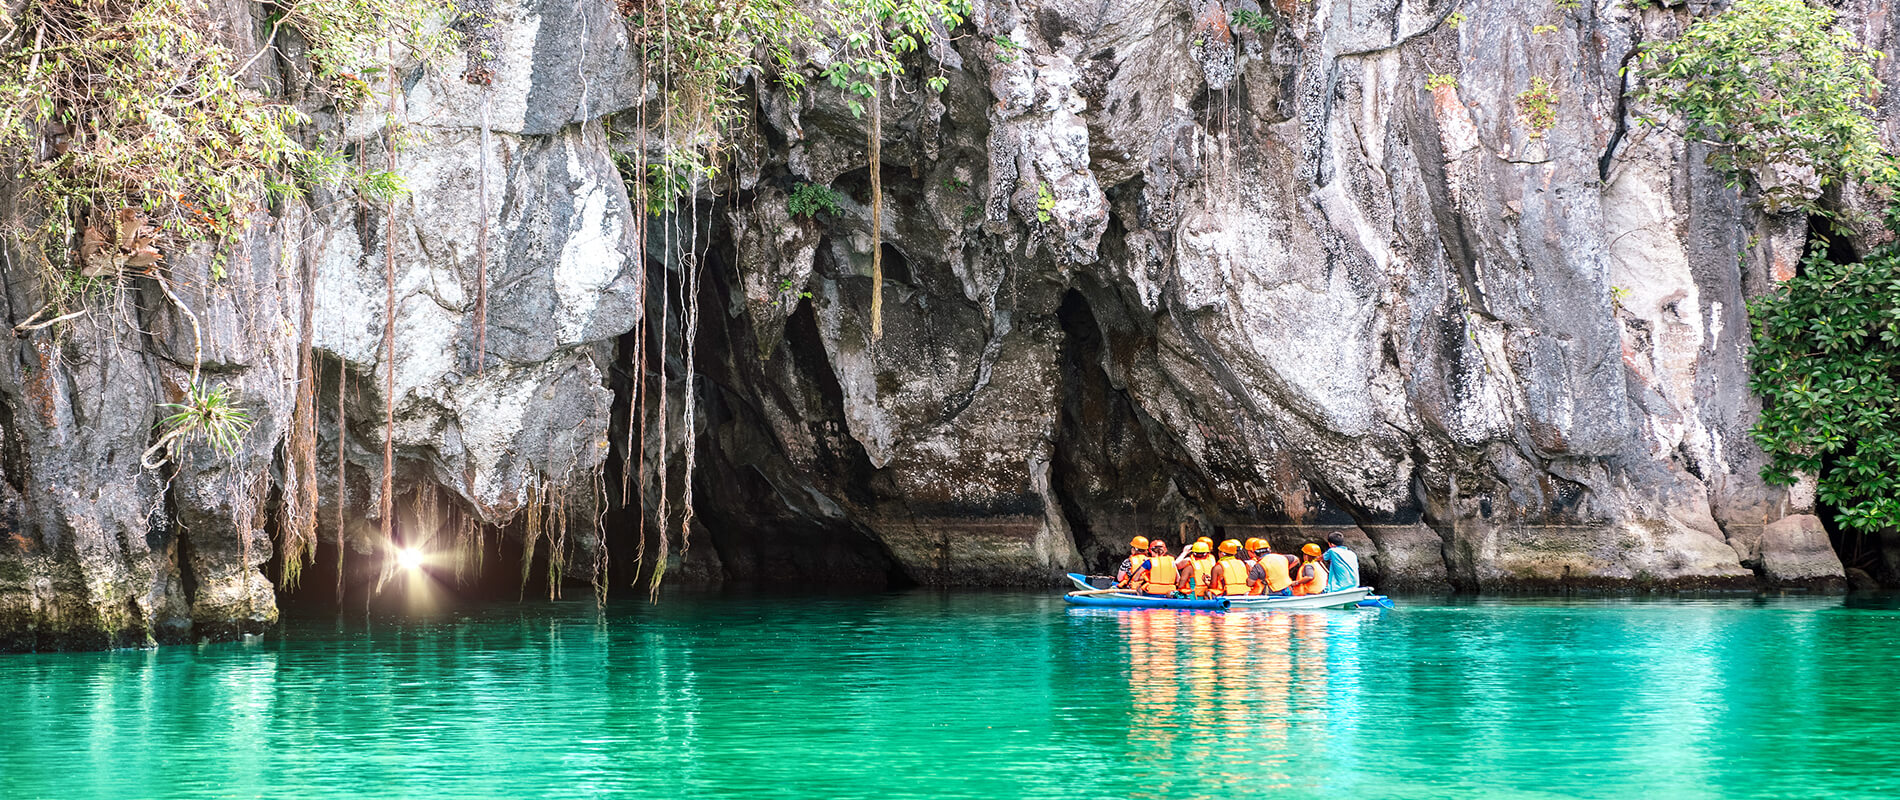 Natuturingan Cave, il tesoro sotterraneo dell'isola di Palawan